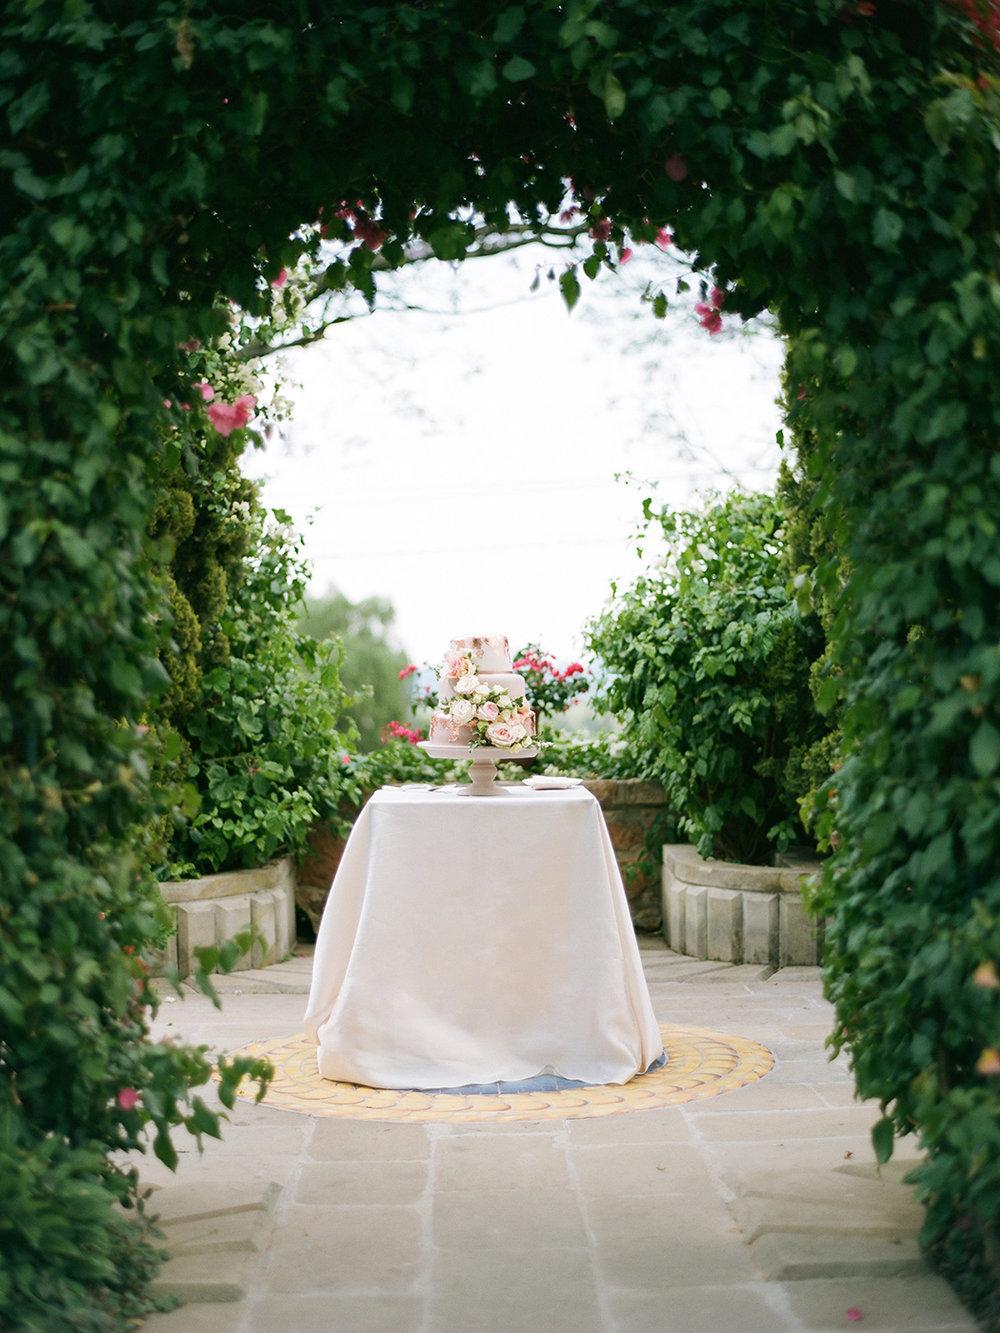 Wedding Cake | Rensche Mari Photography